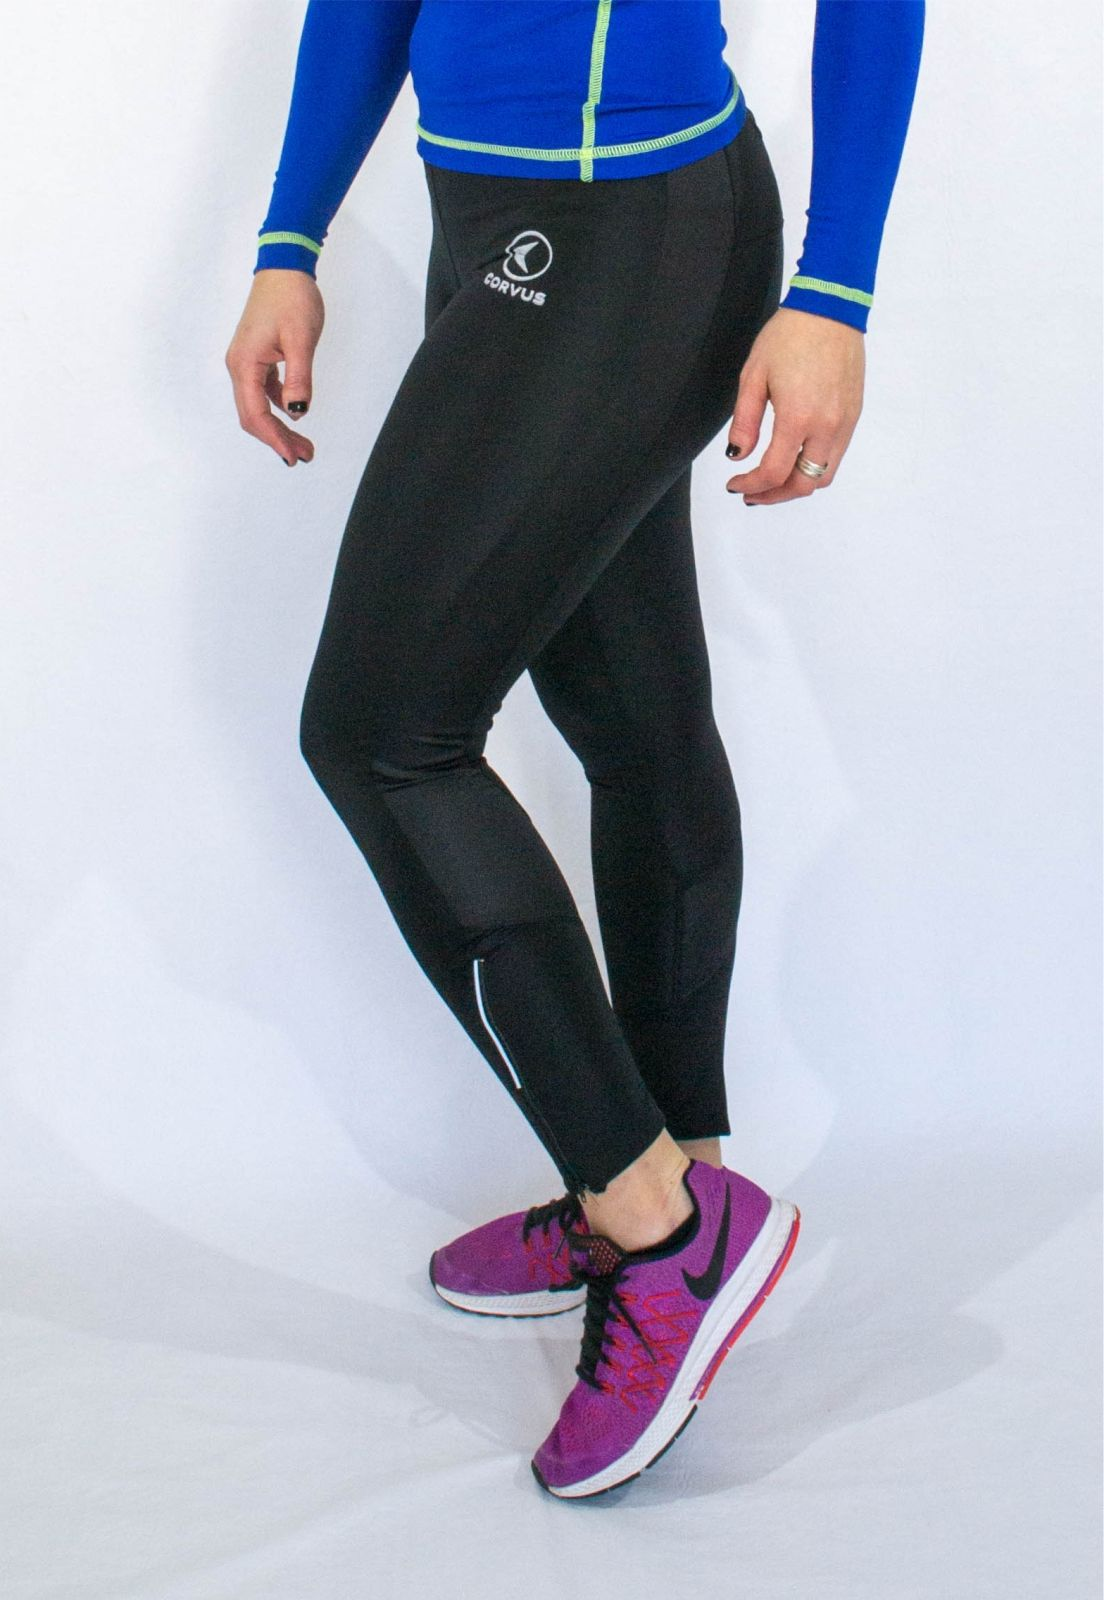 149abe2dd  sprint  calza  leggins  Corvus  Ropa  Deportiva Calzas largas  confeccionadas en